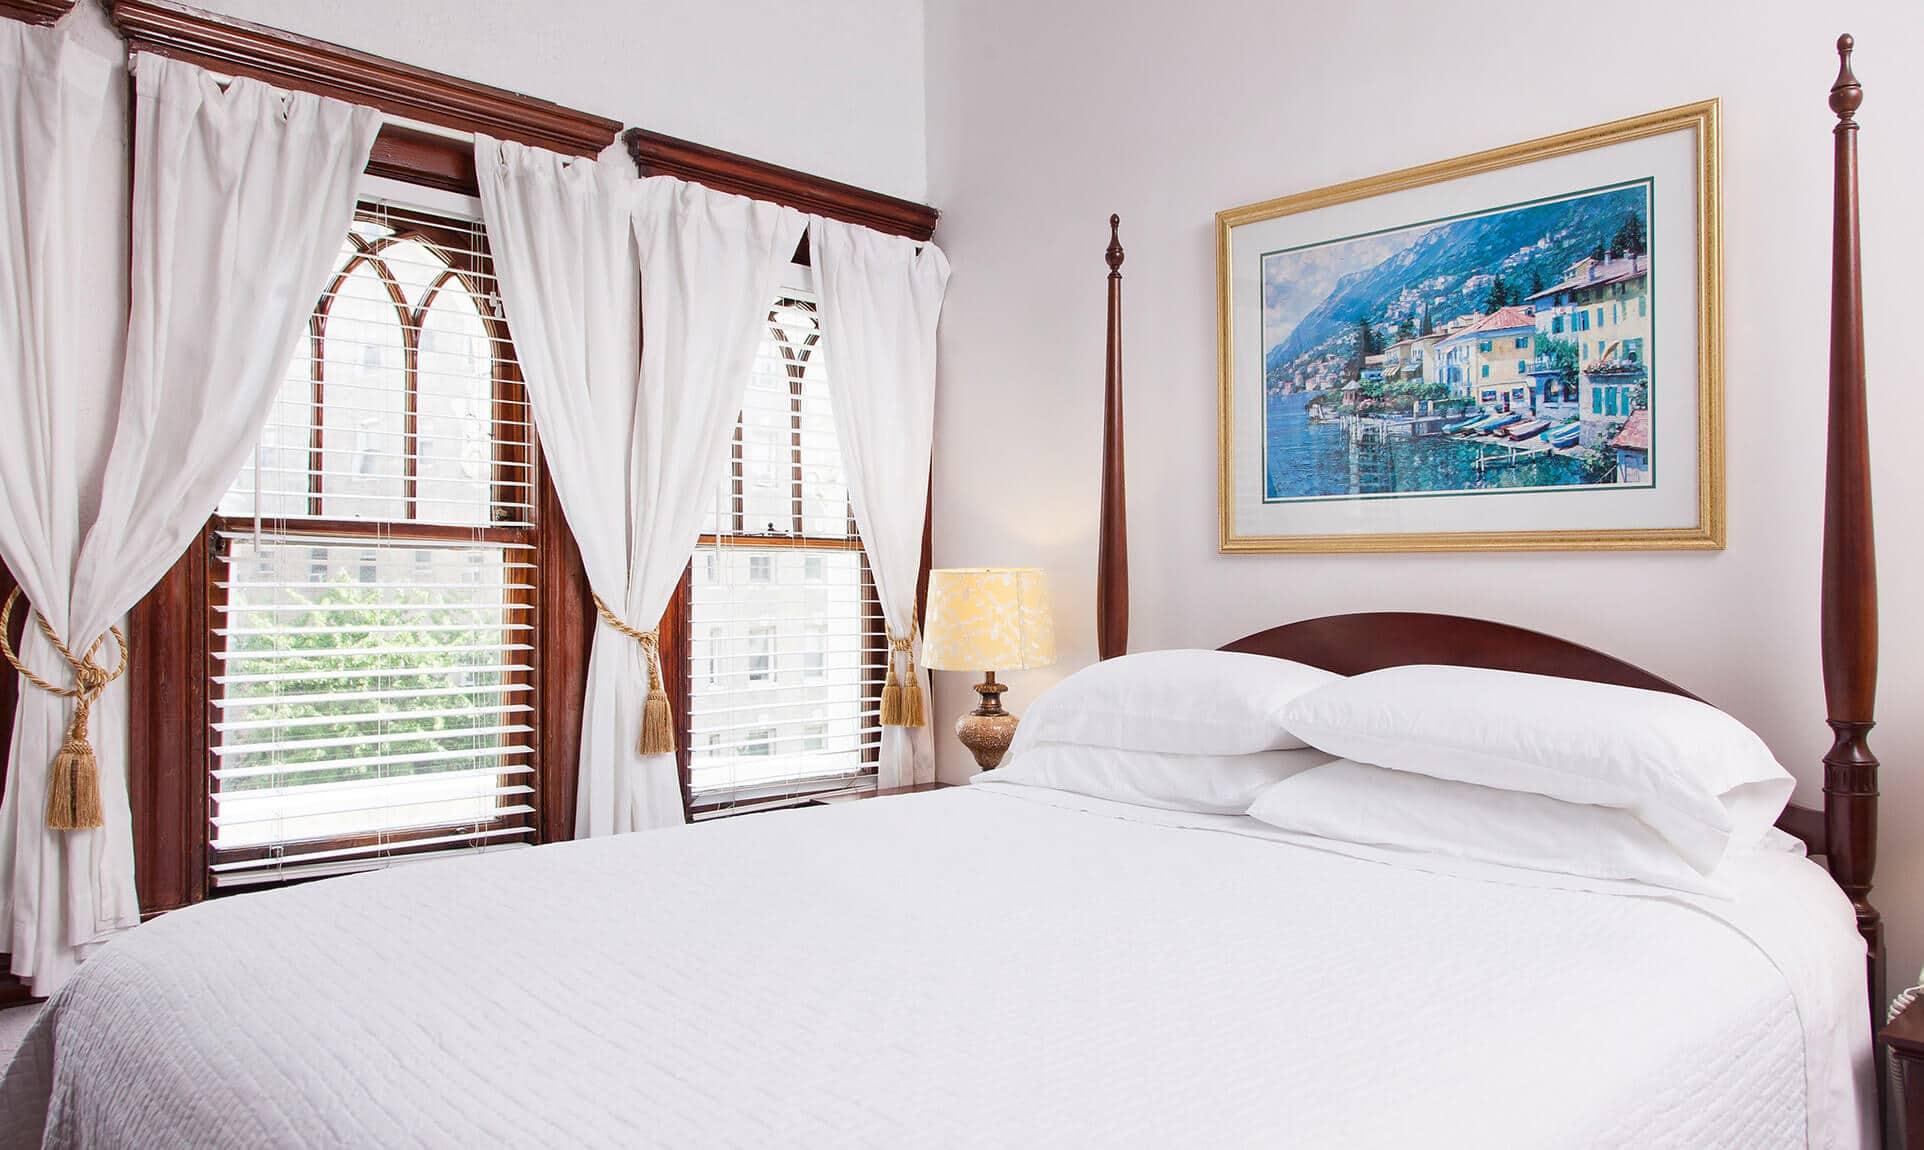 Room 401 bed